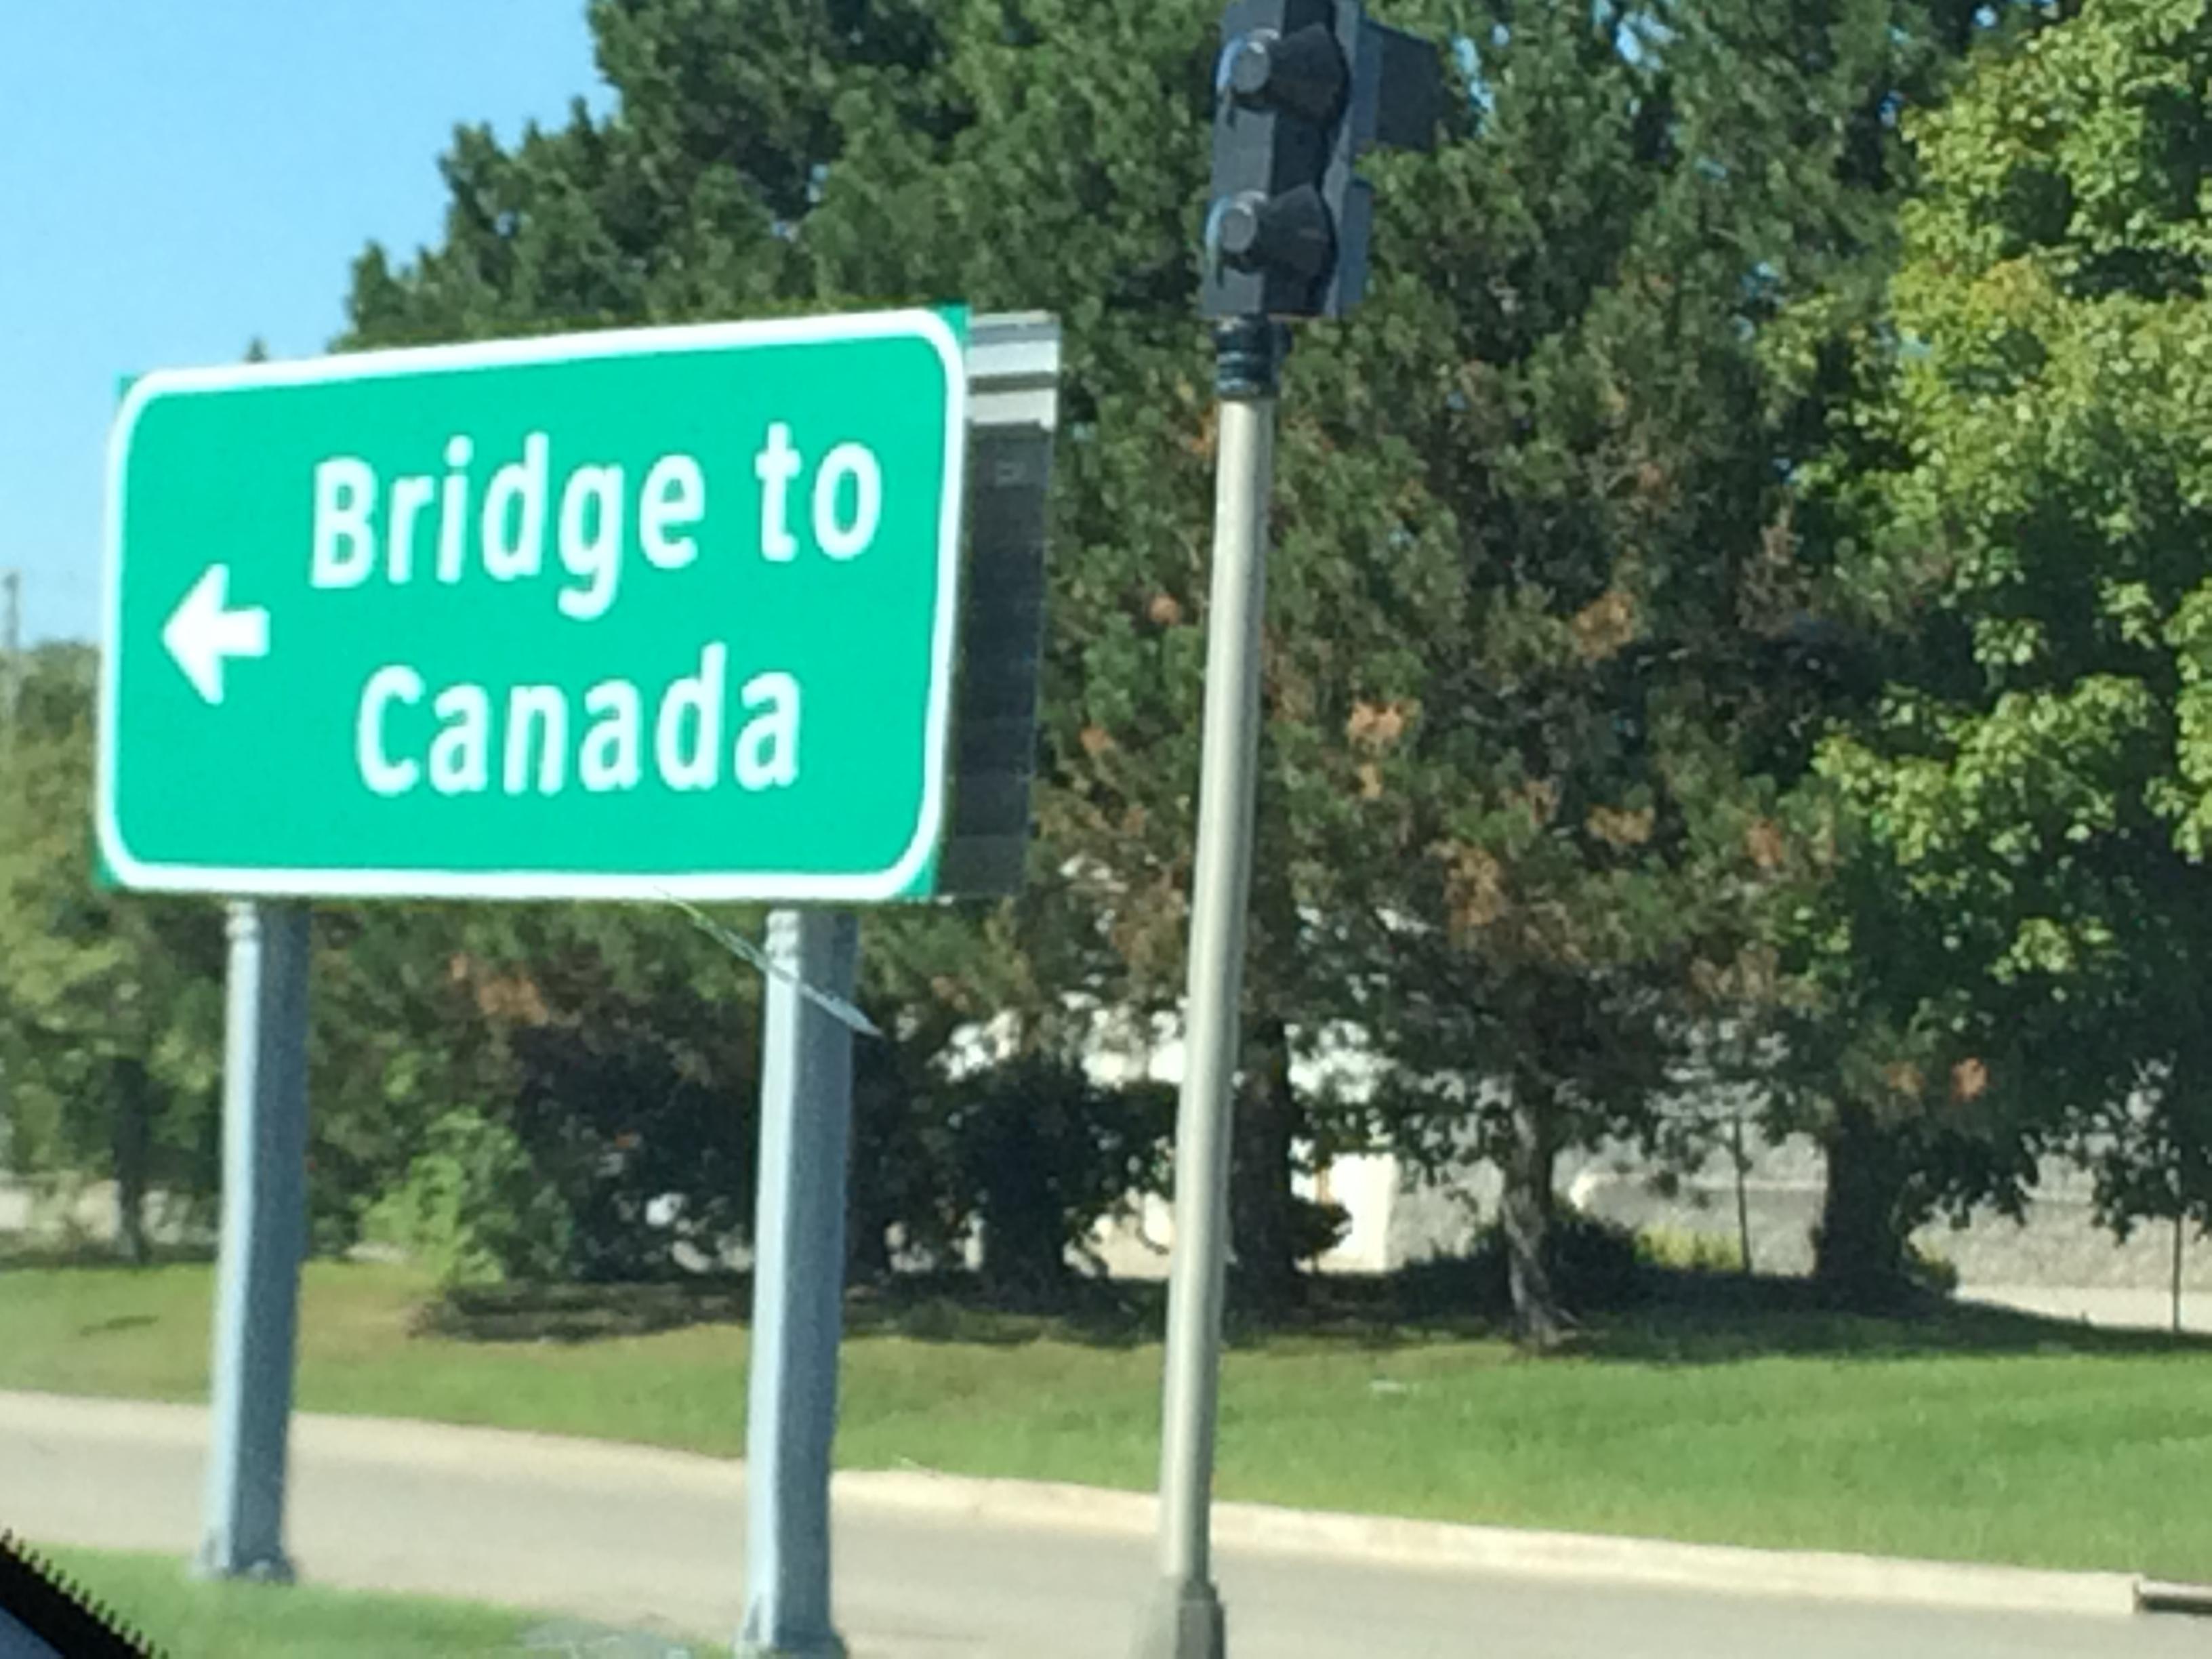 Headed to Canada!